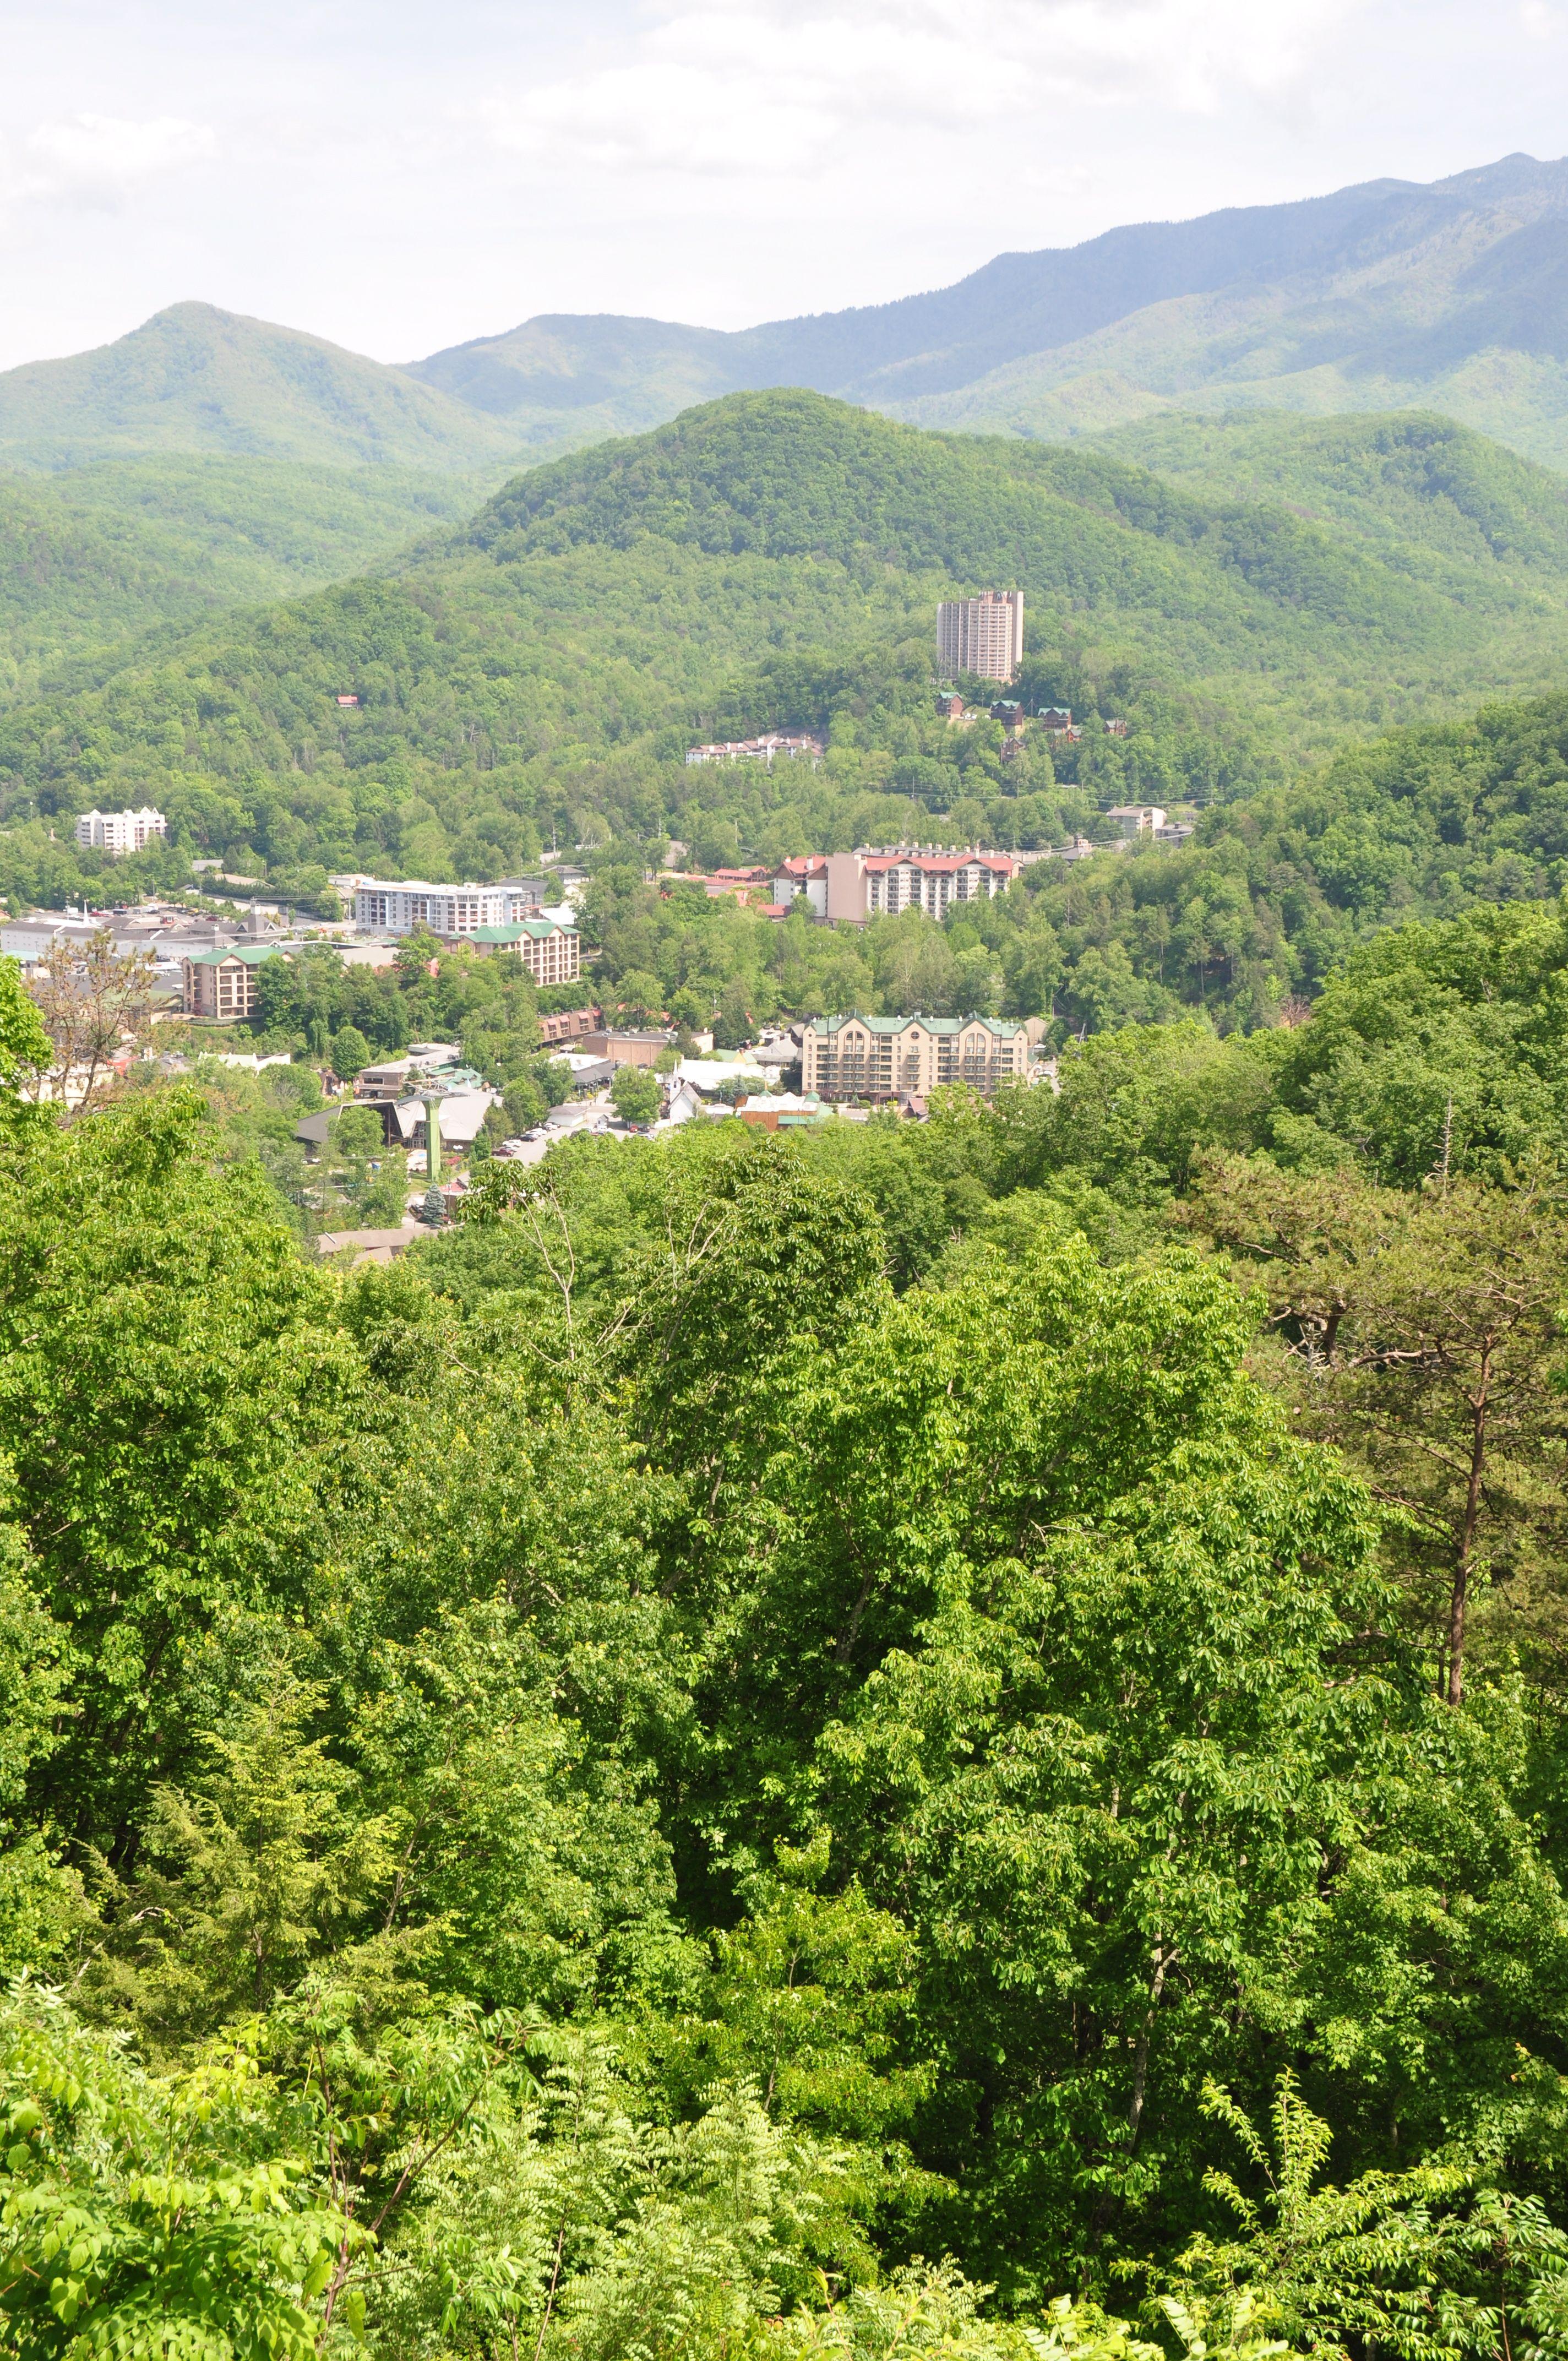 cabins vacation bear tn rental property black gatlinburg in hideaway redawning sevierville